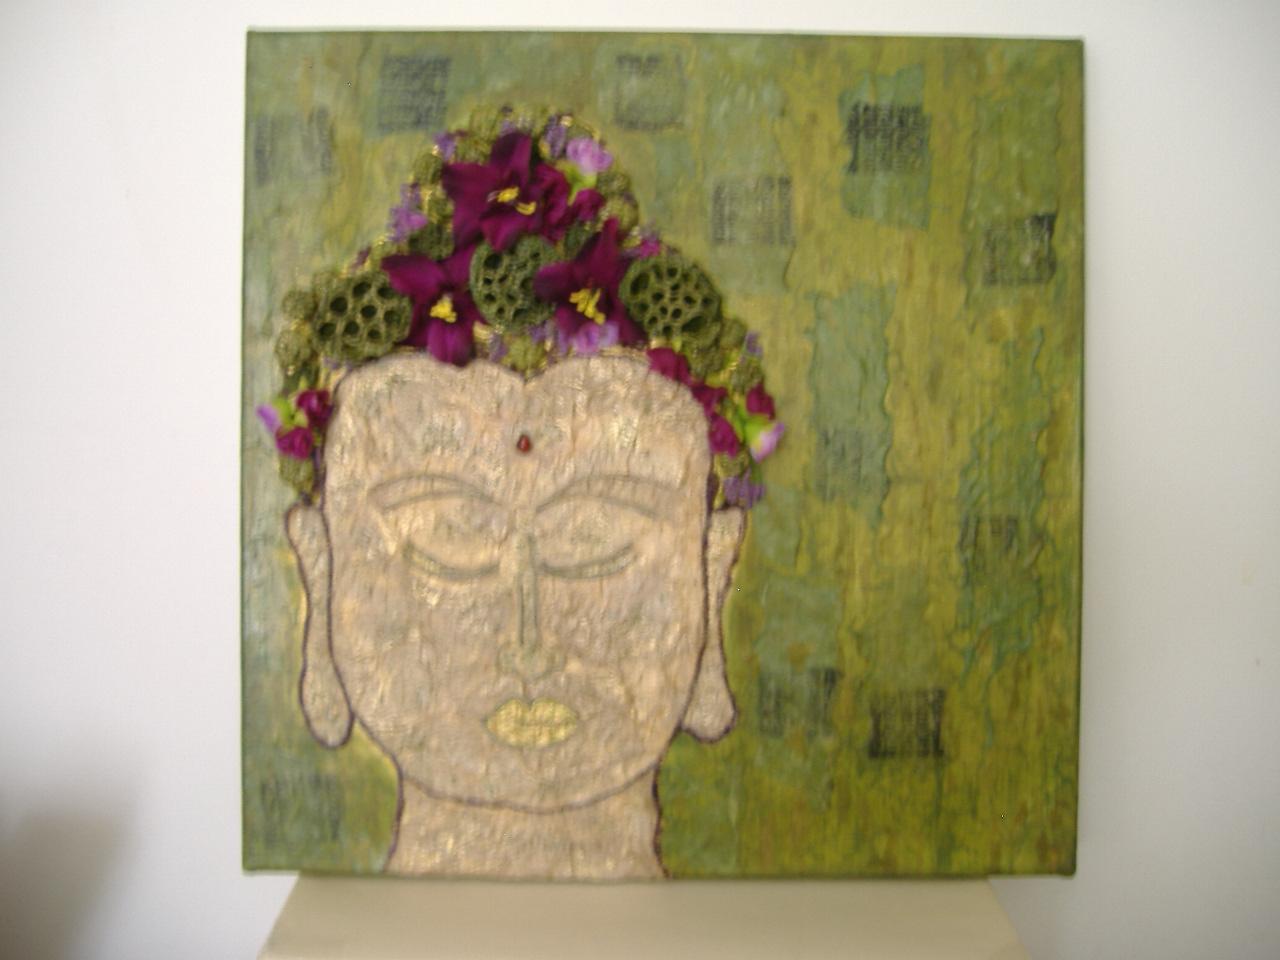 35567 || 3456 || purple buddha